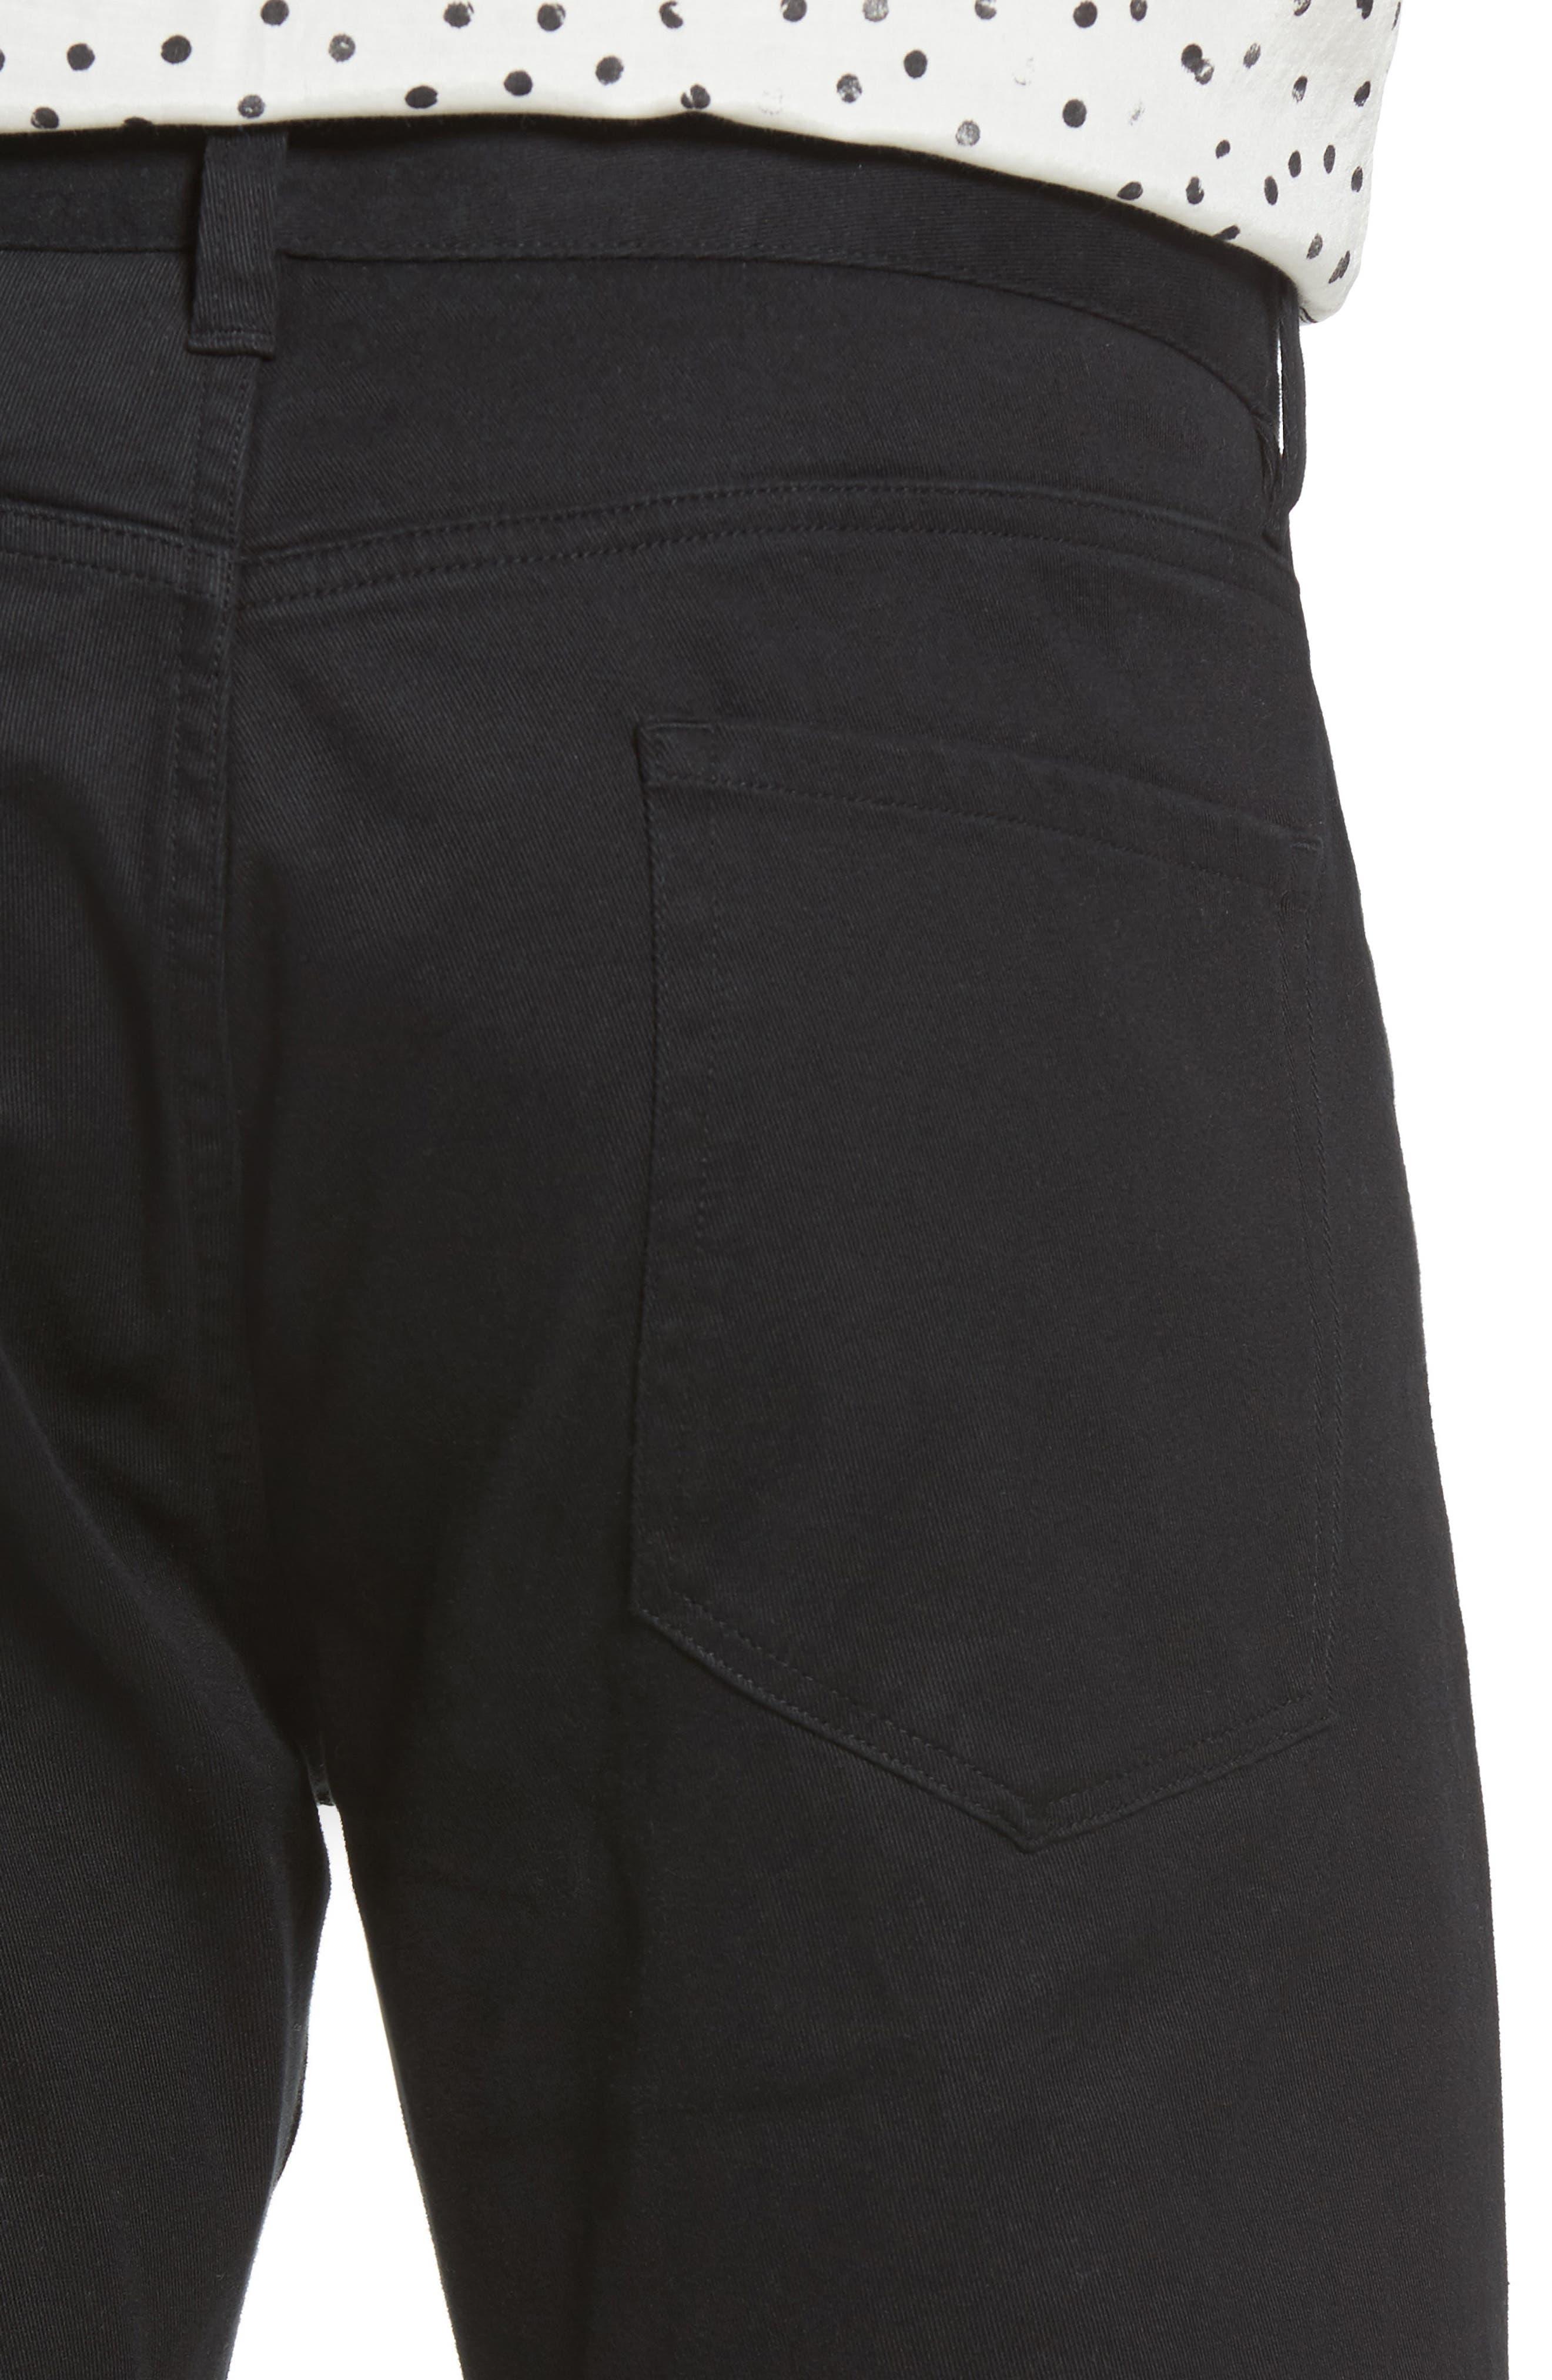 VINCE,                             Soho Slim Fit Five-Pocket Pants,                             Alternate thumbnail 4, color,                             001